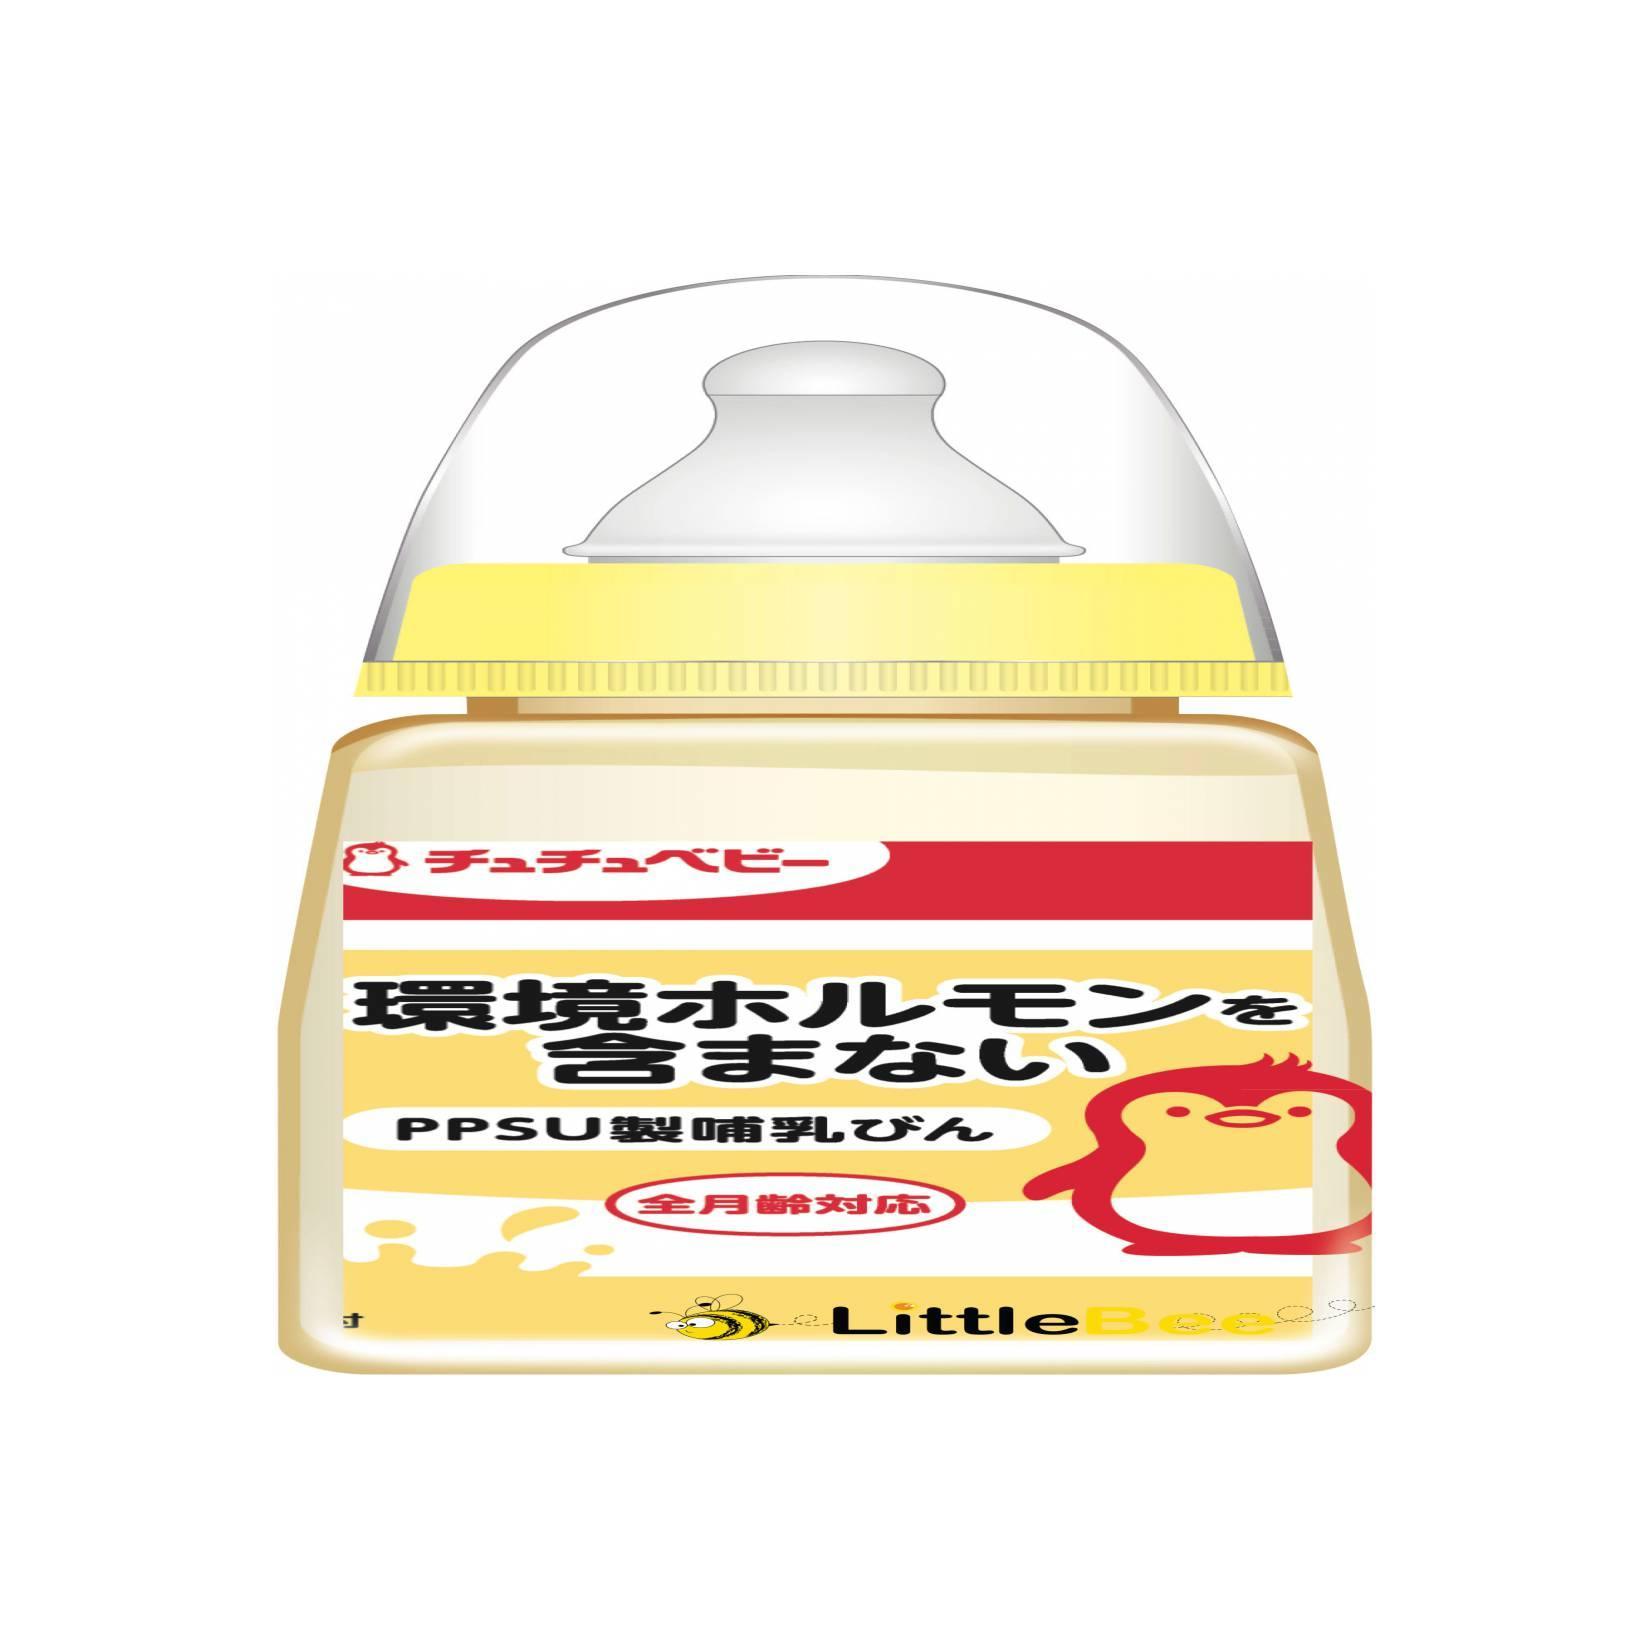 CHUCHU PPSU Baby Feeding Bottle - 150 ml